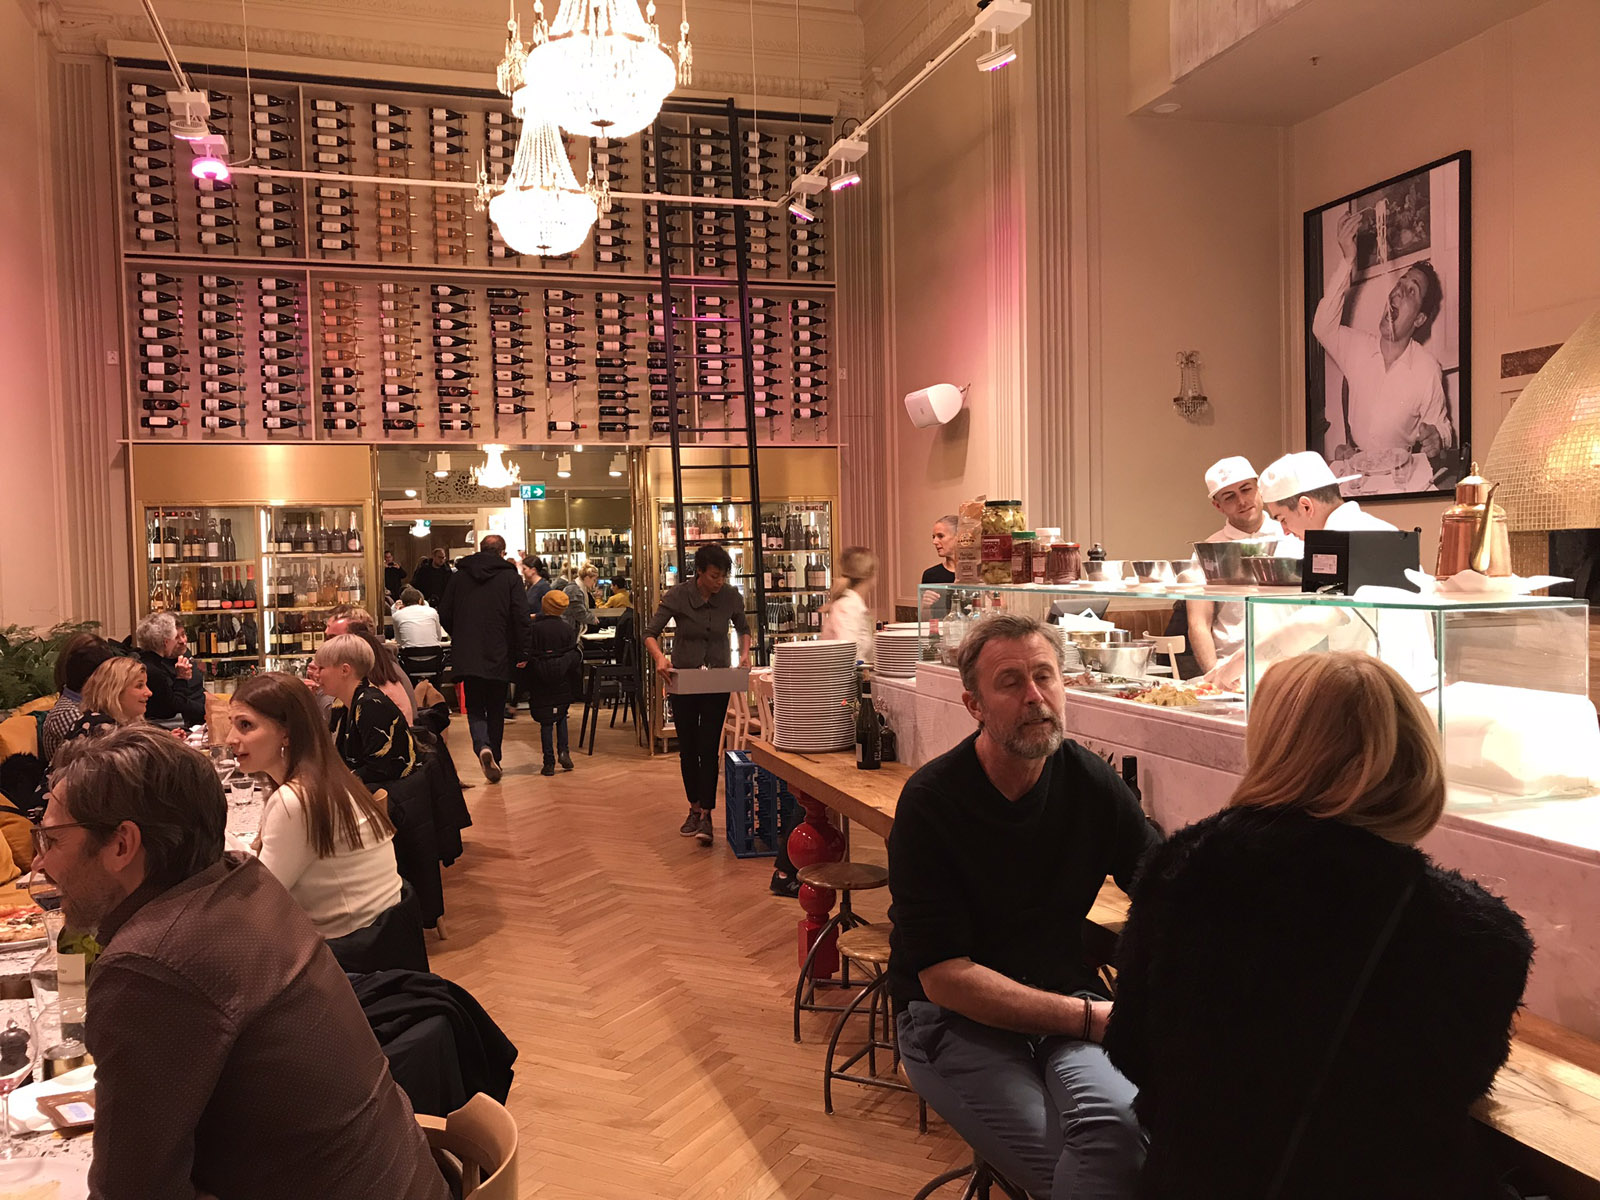 eataly restaurang stockholm